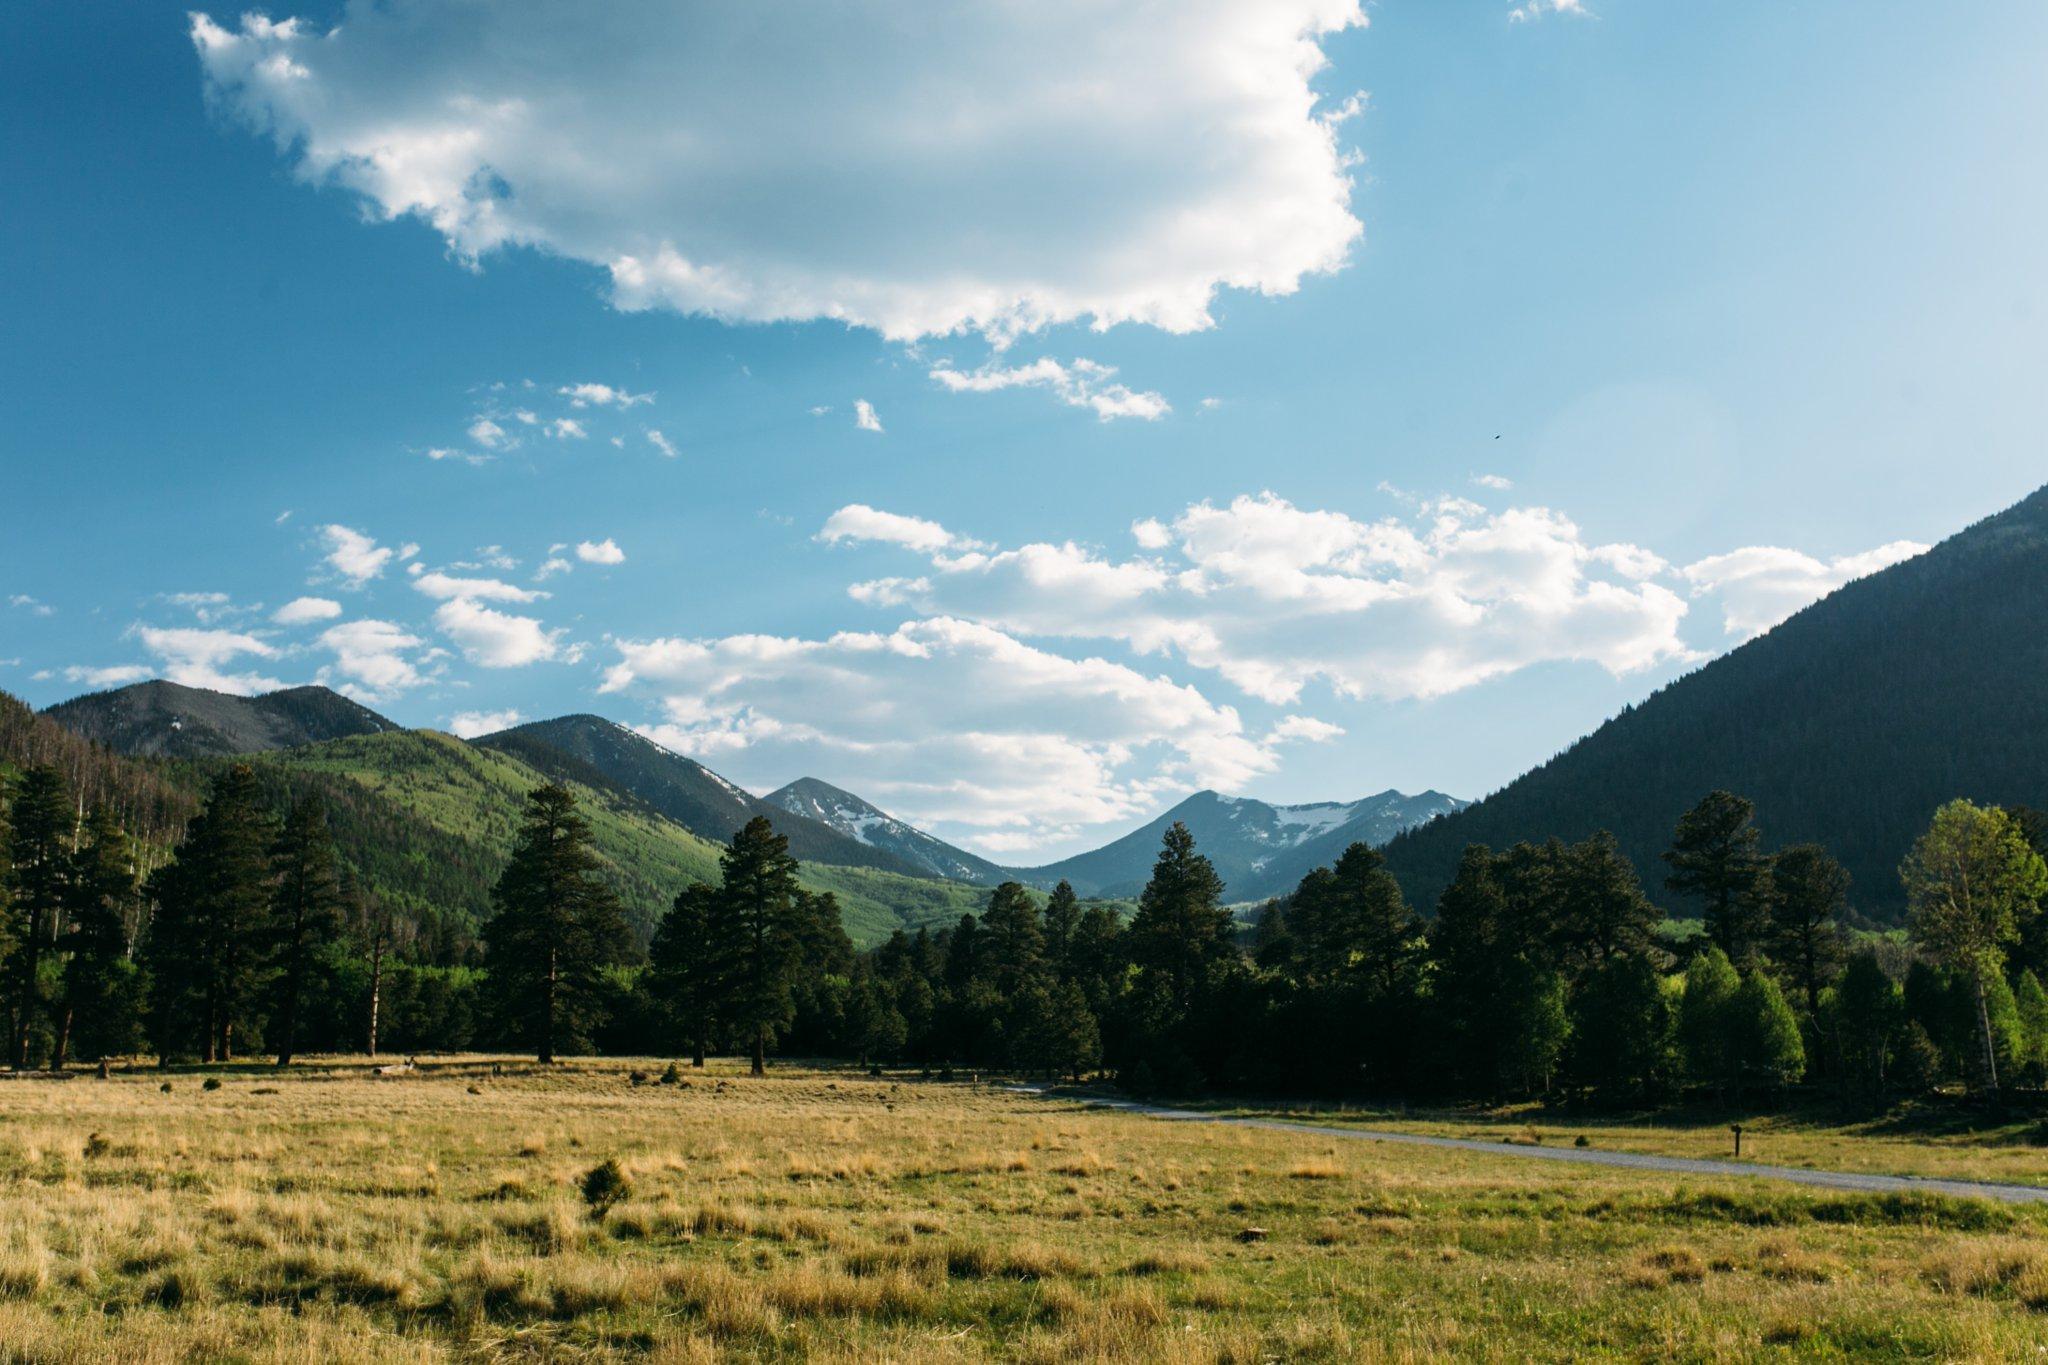 Lockett Meadow Flagstaff AZ in summer